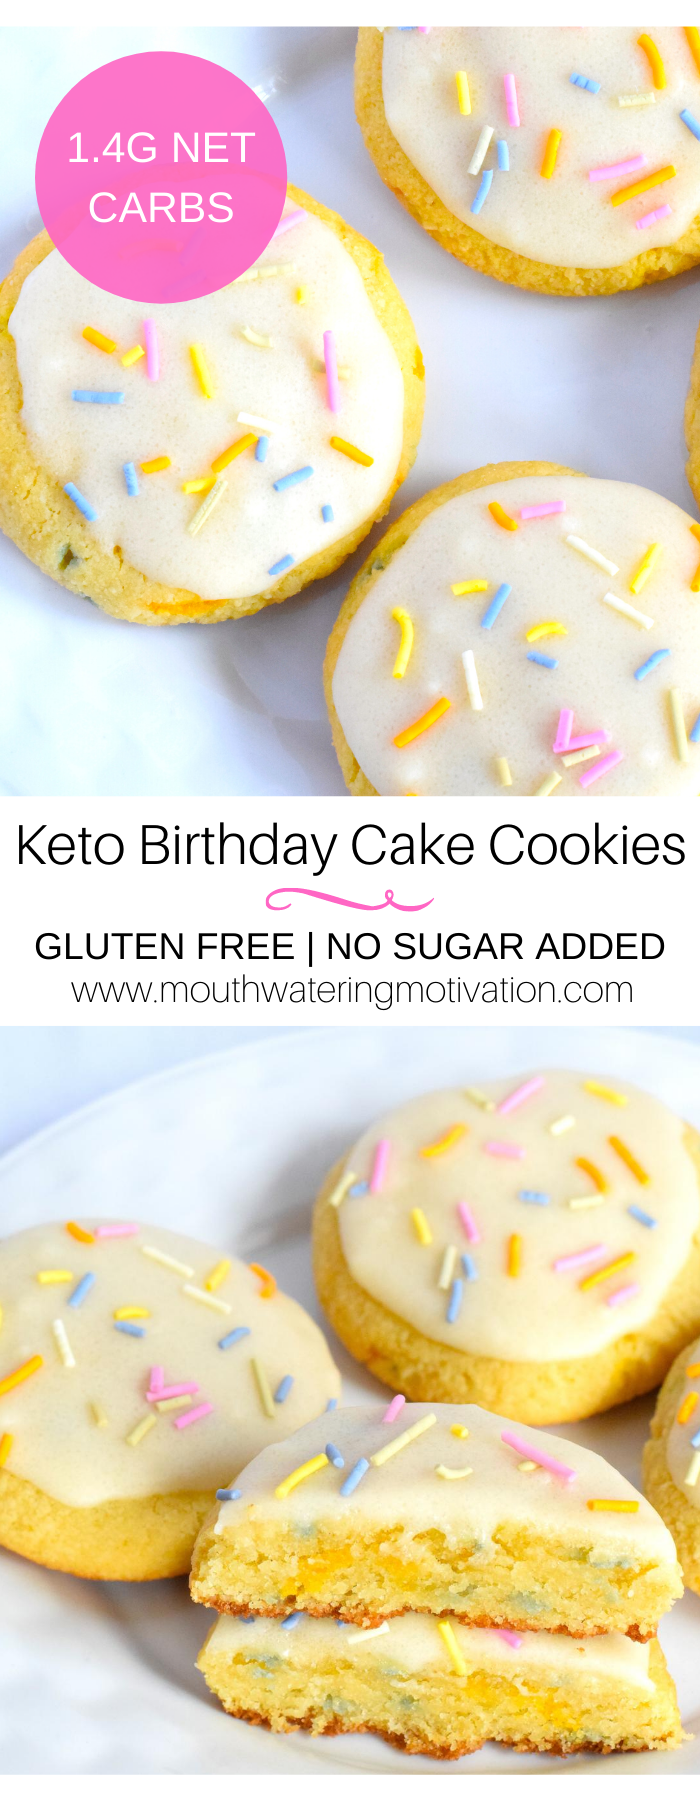 Keto Birthday Cake Cookies-2